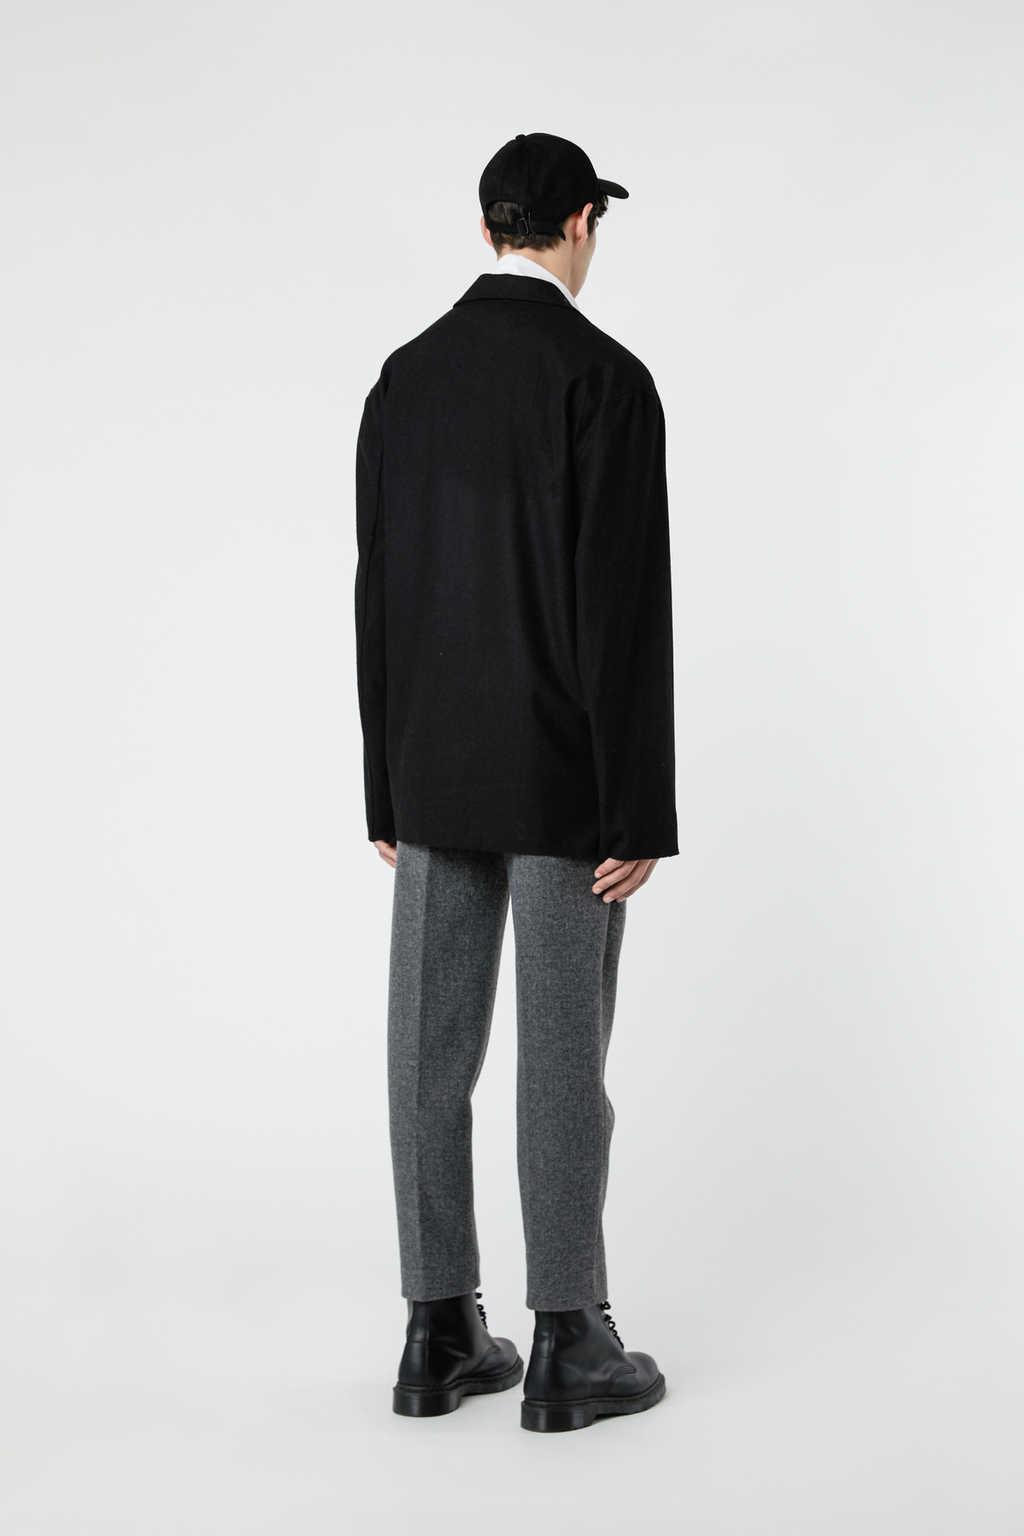 Jacket J002M Black 10